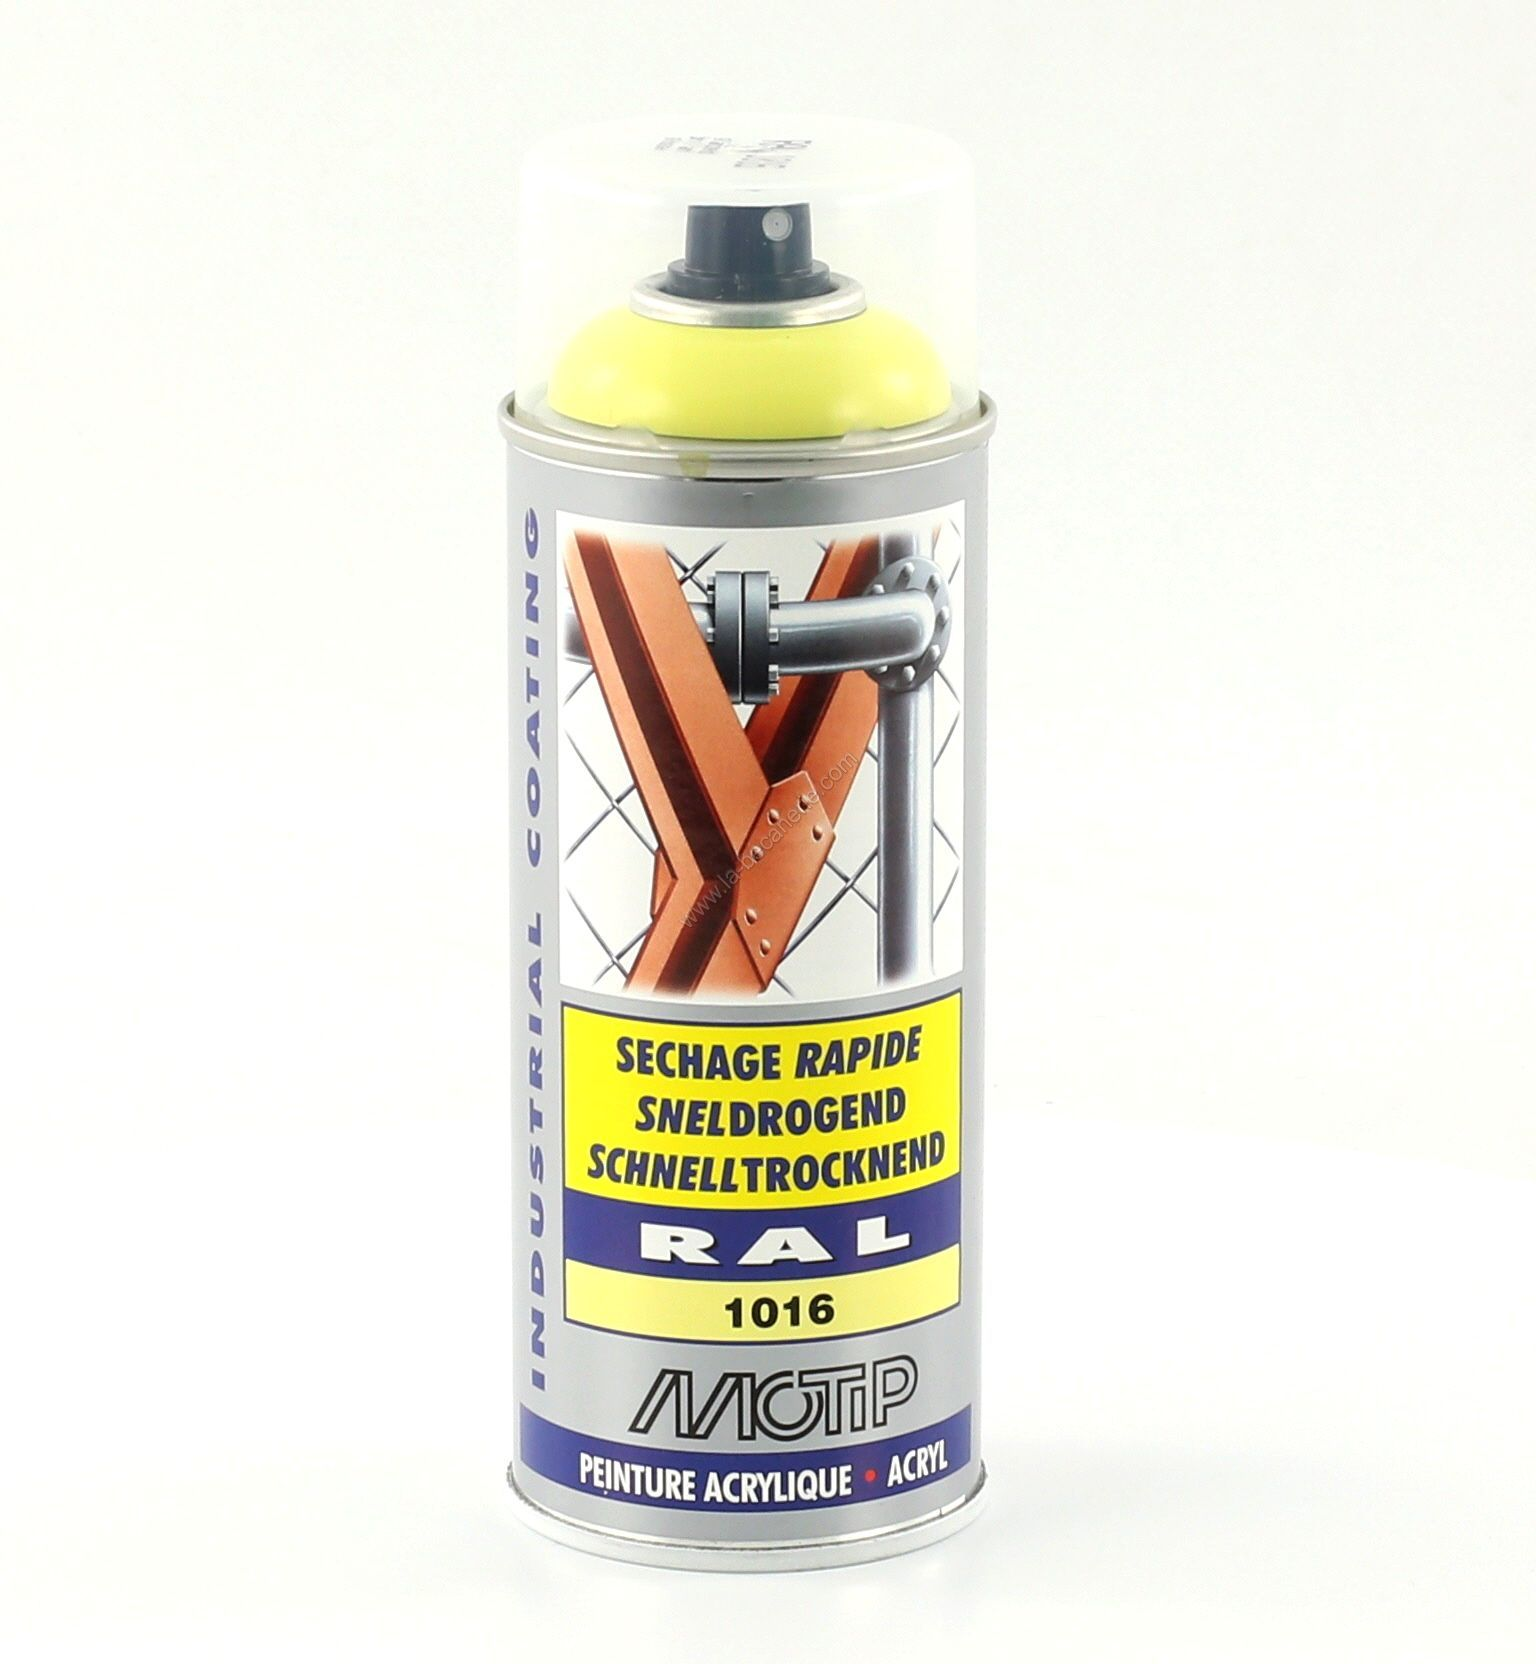 bombe peinture jaune soufre brillant acrylique ral 1016 motip 400 ml m07003. Black Bedroom Furniture Sets. Home Design Ideas